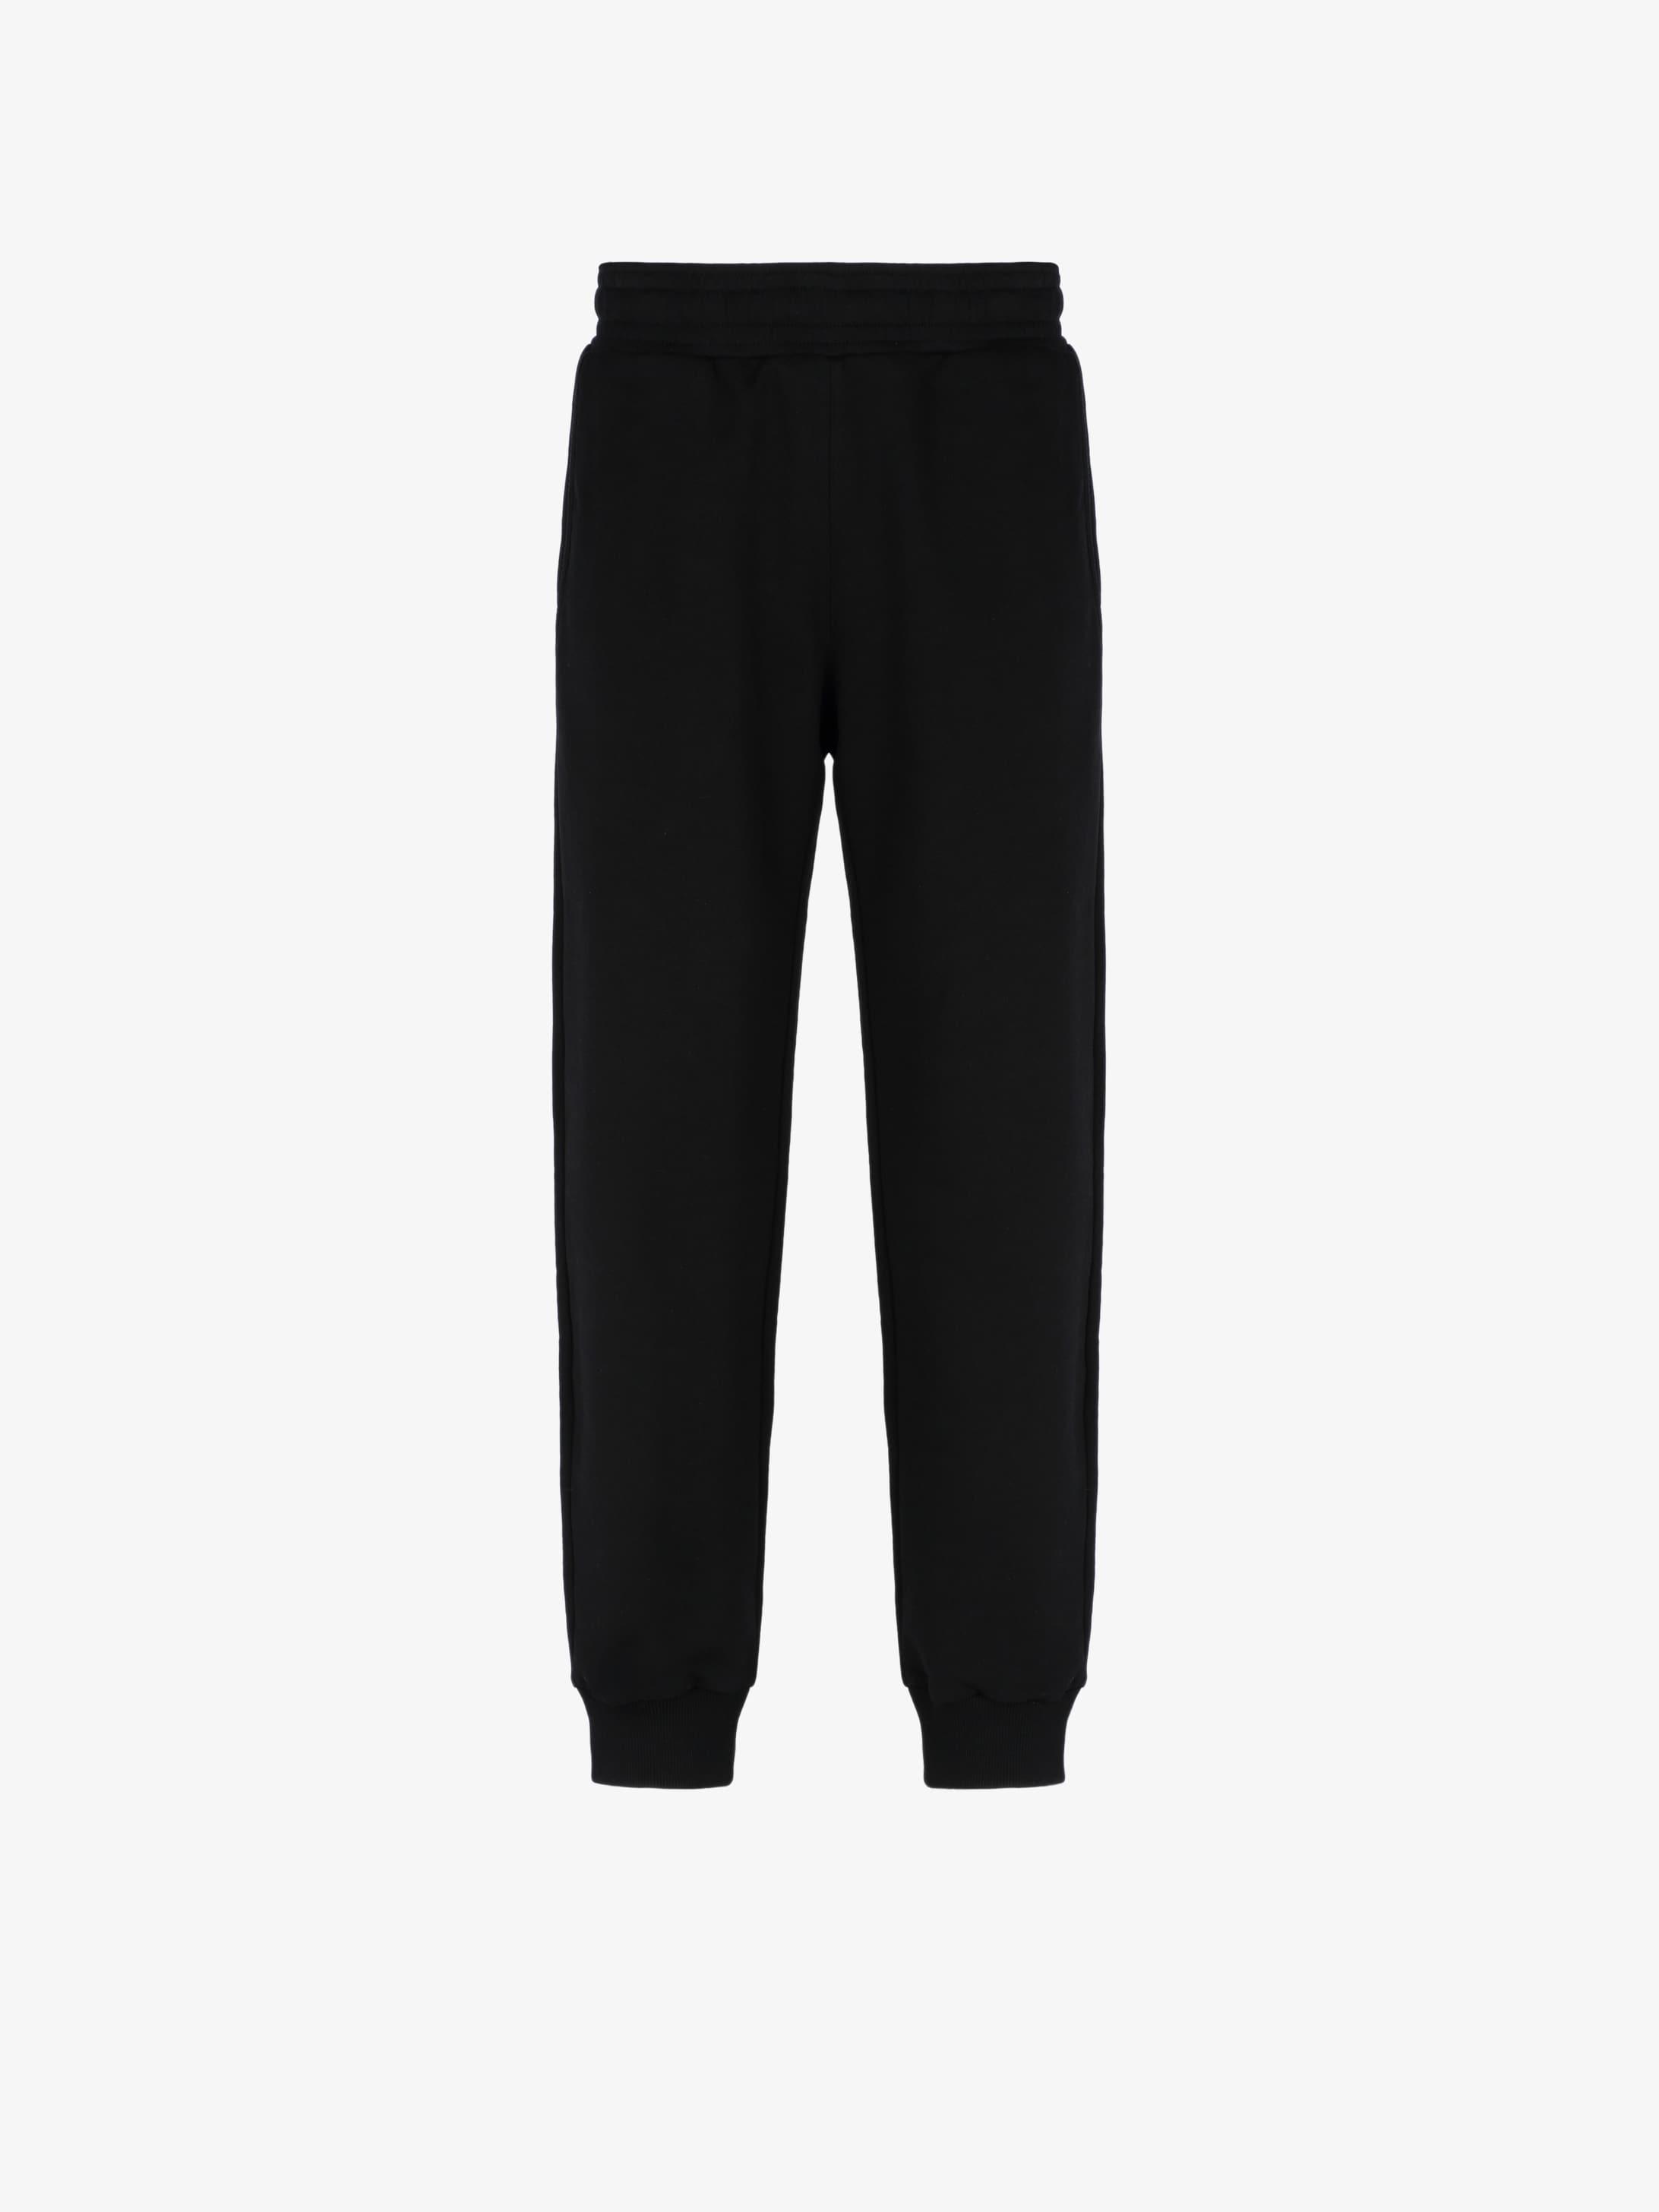 Calligraphic printed jogger pants